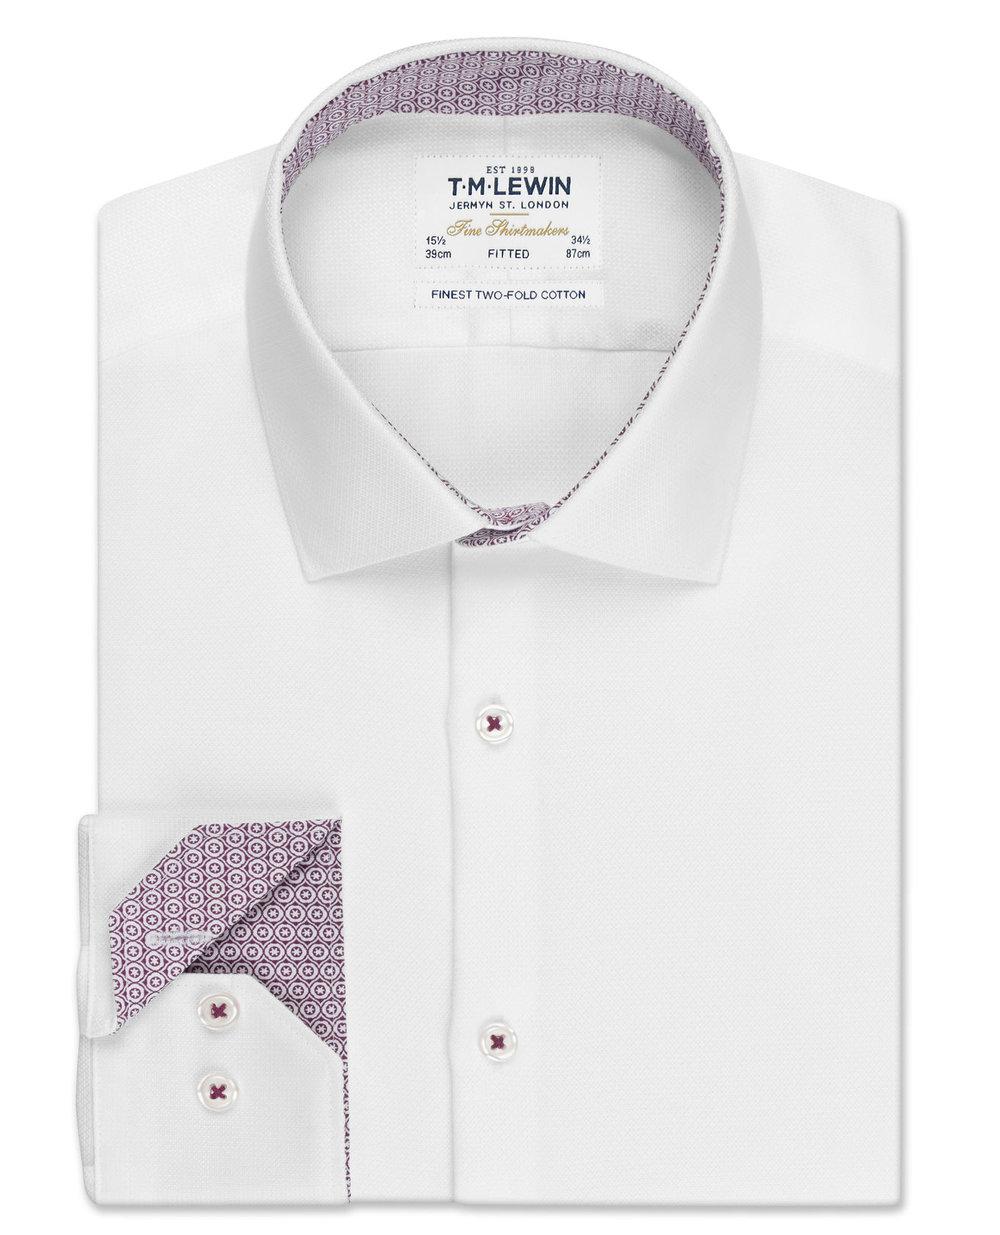 TMLEWIN fitted white dress shirt.jpg